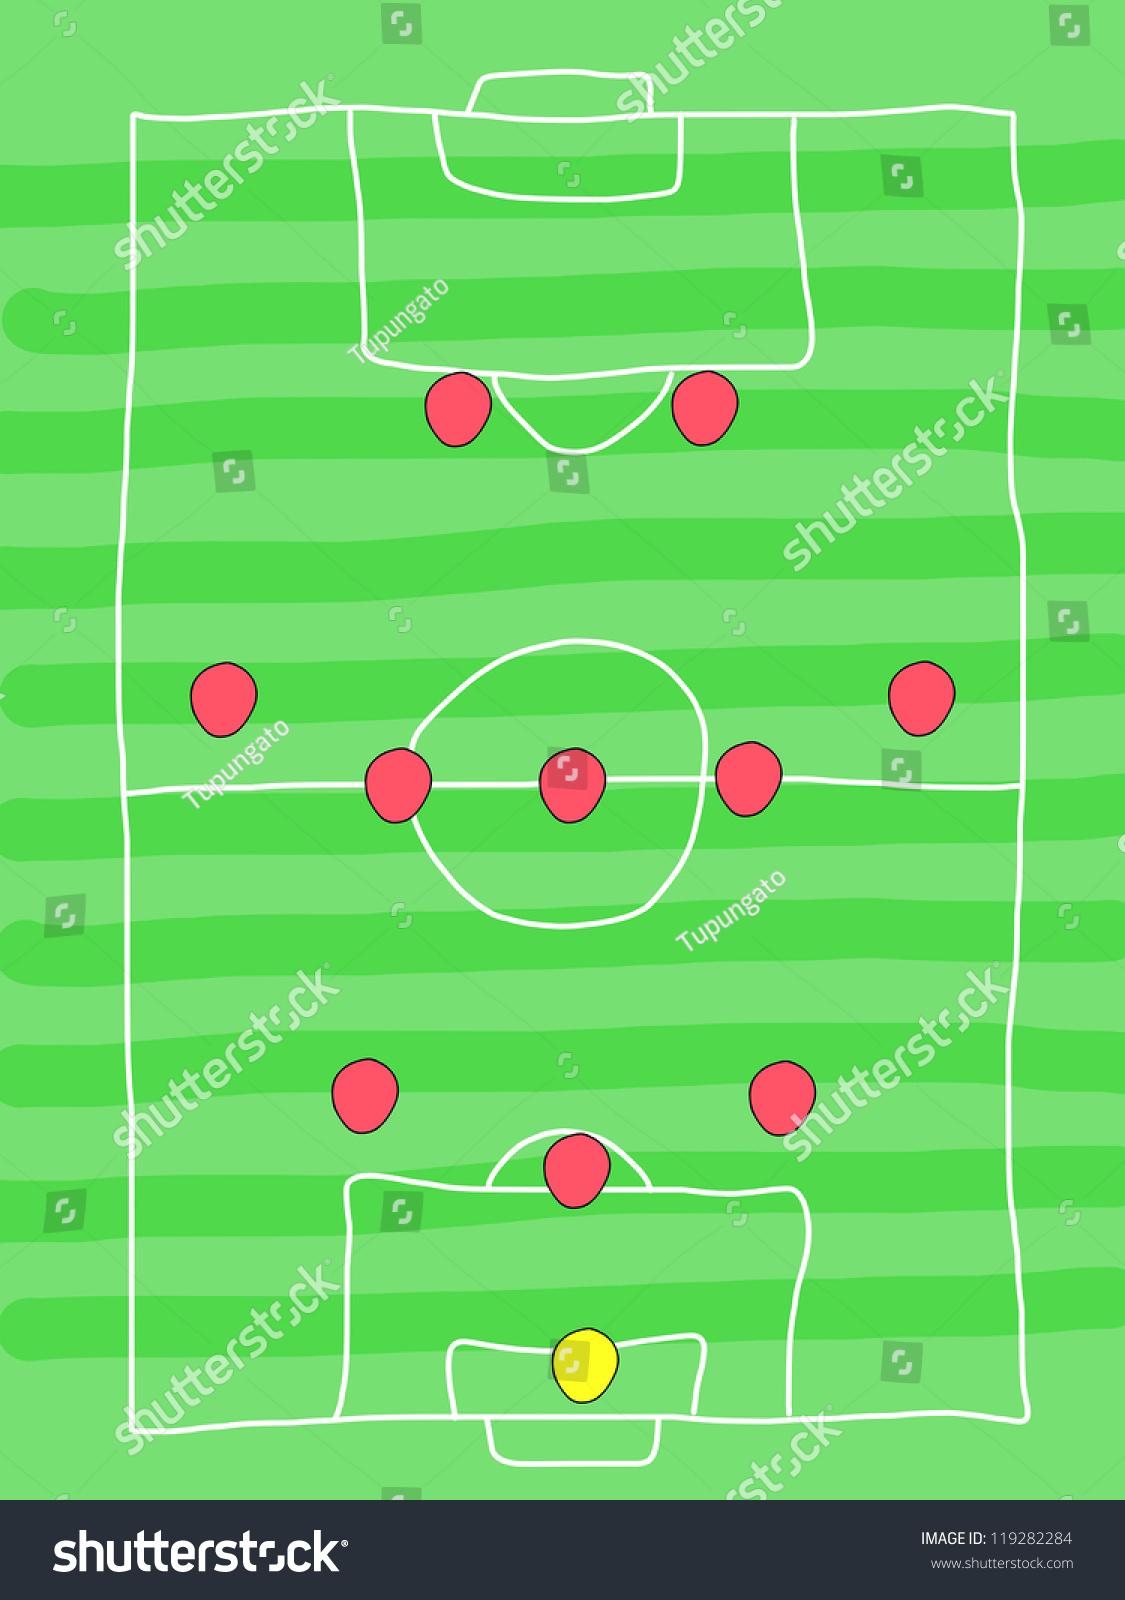 Soccer Field Doodle Drawing Football Tactics Stock Illustration